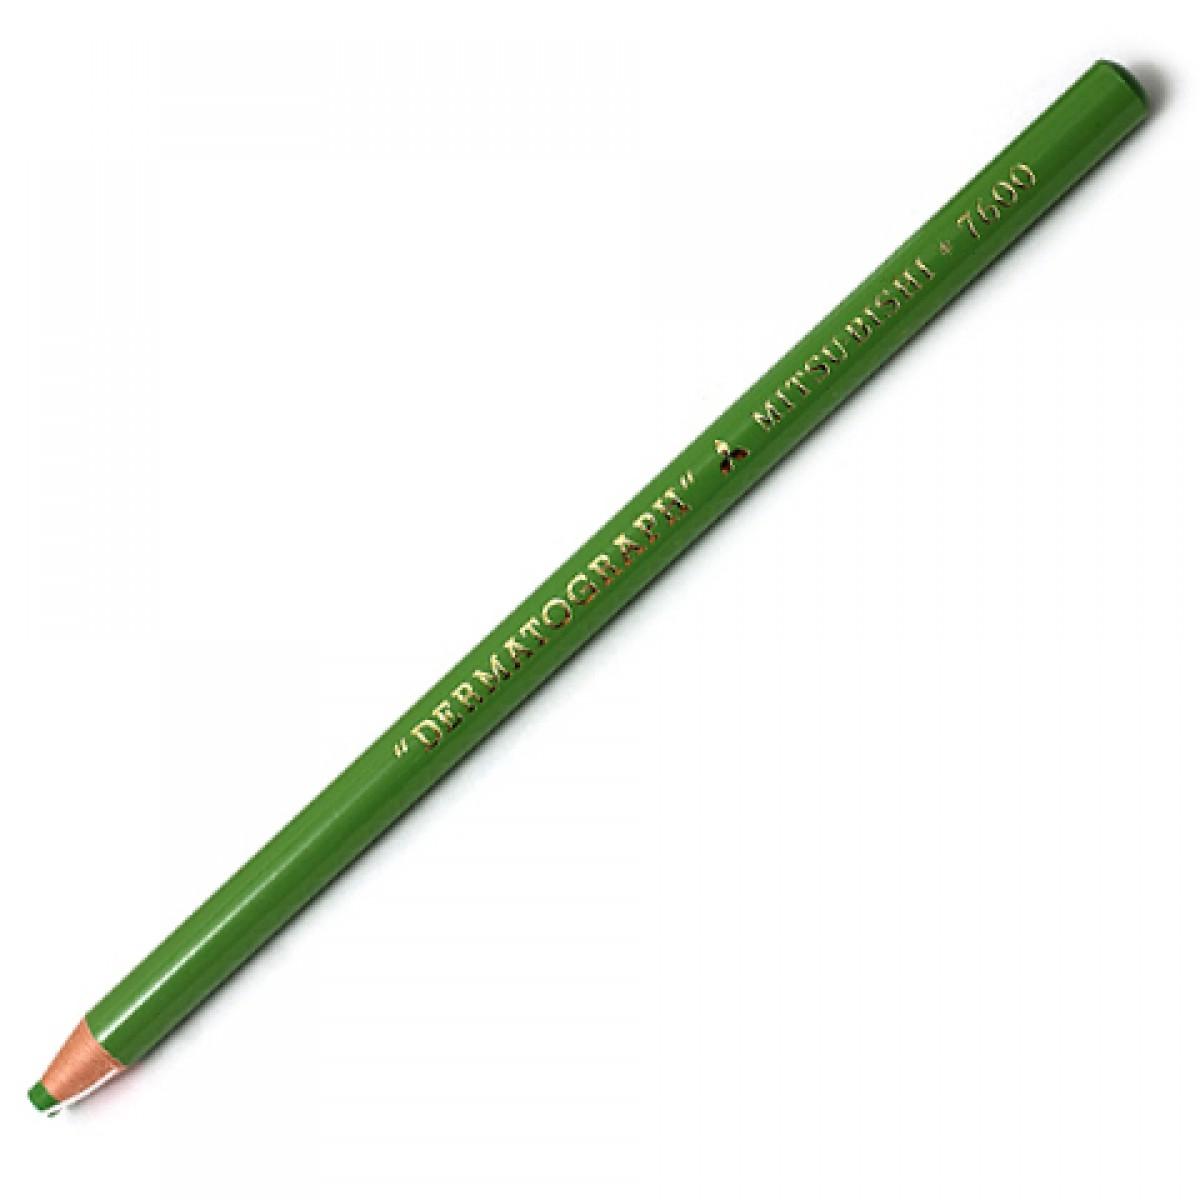 Lápis Dermatográfico Mitsubishi 7600 Verde